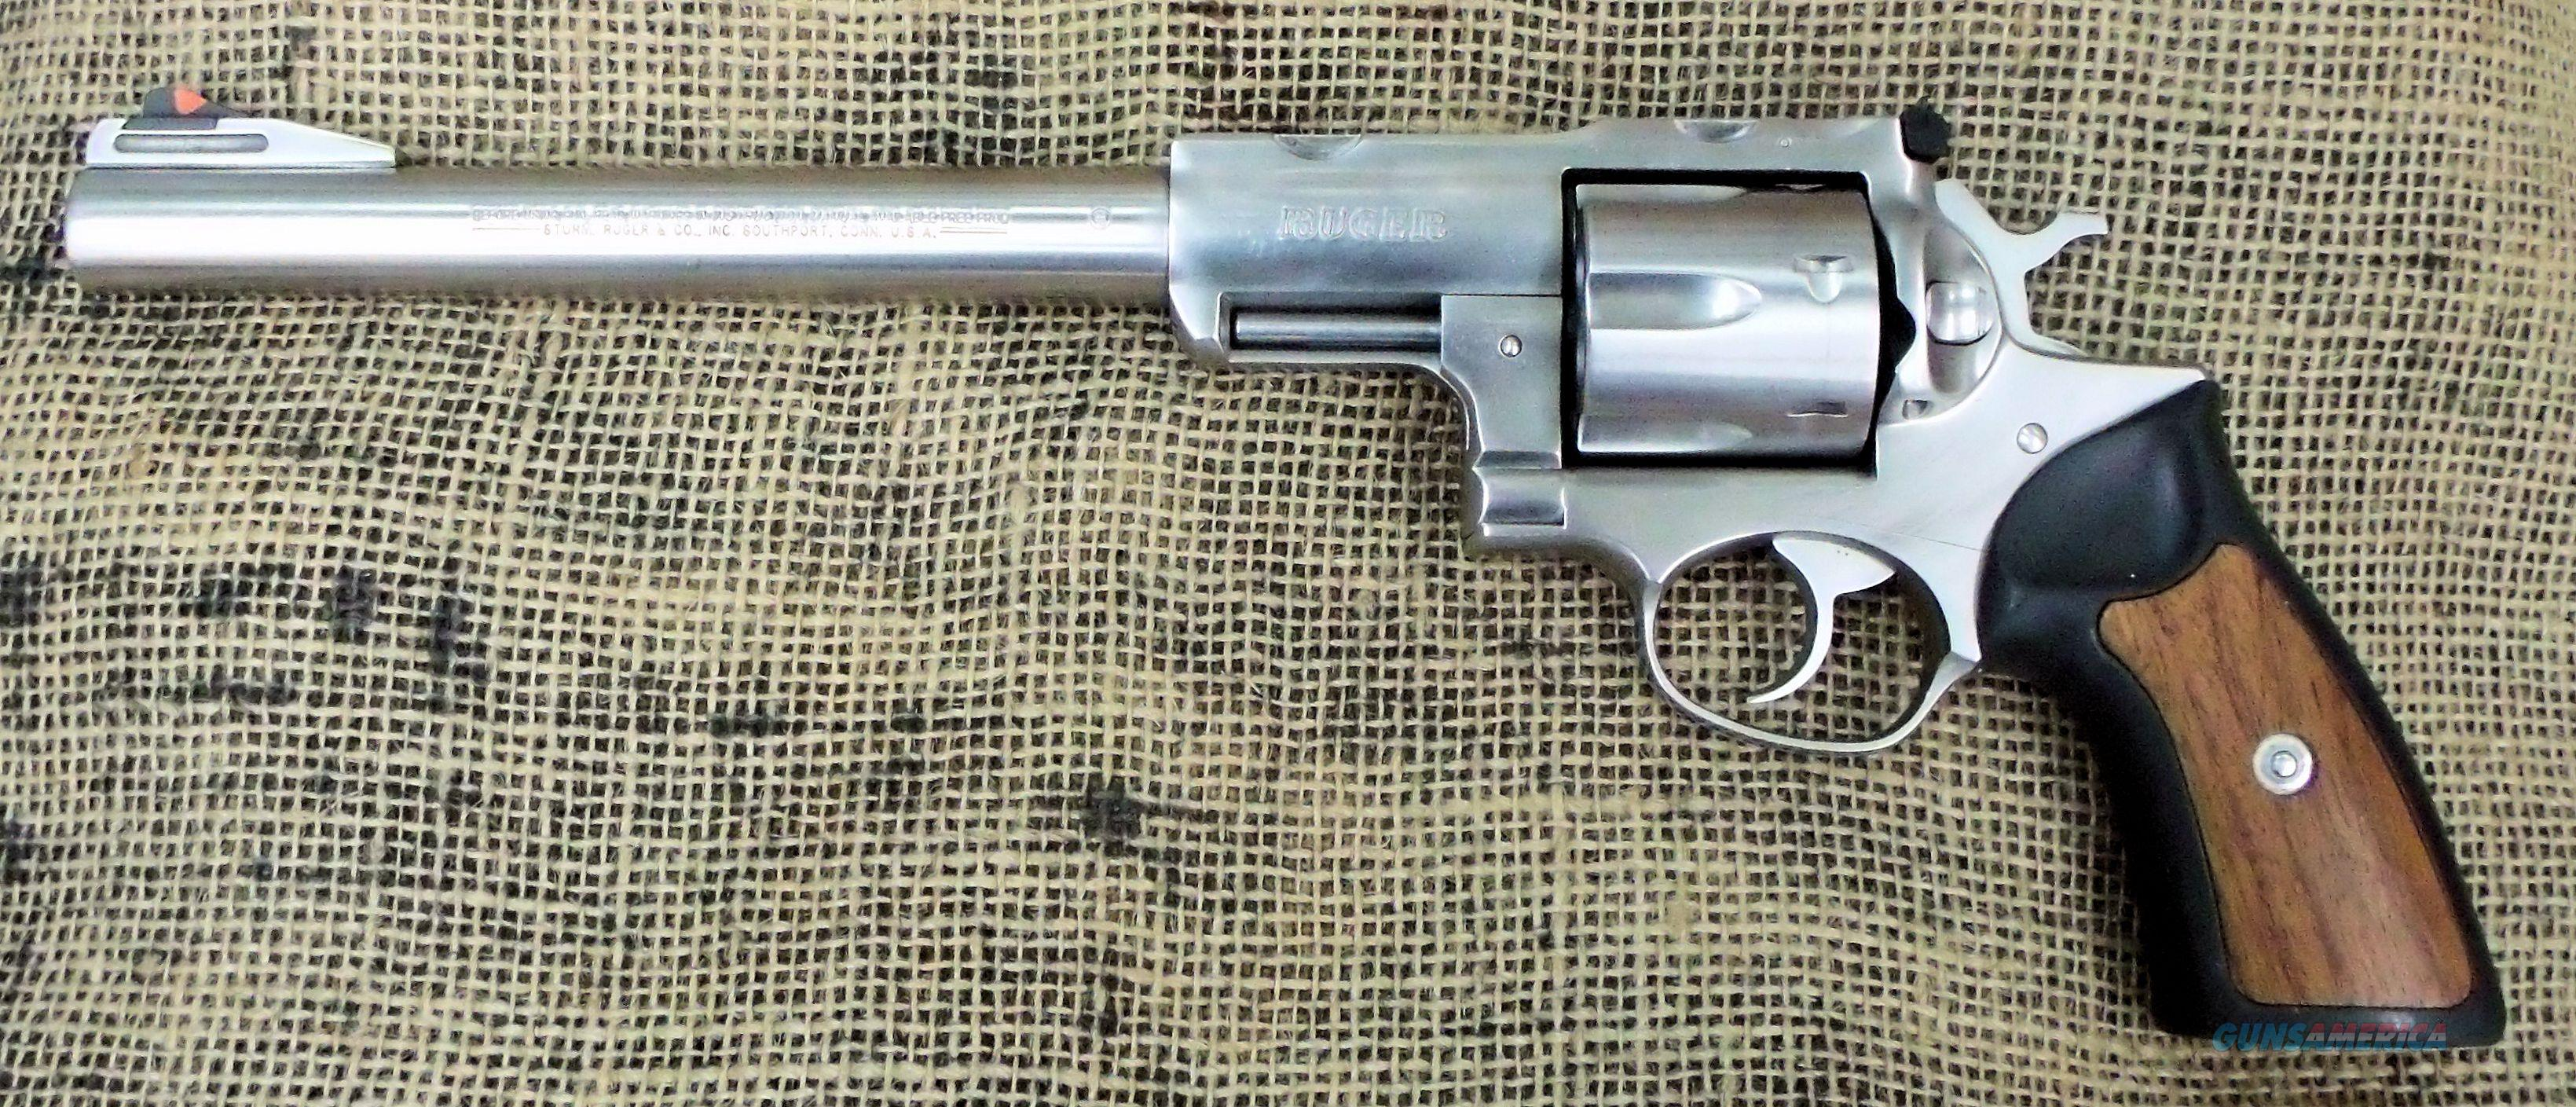 Ruger Super Redhawk Revolver, 44Mag. Cal.  Guns > Pistols > Ruger Double Action Revolver > Redhawk Type